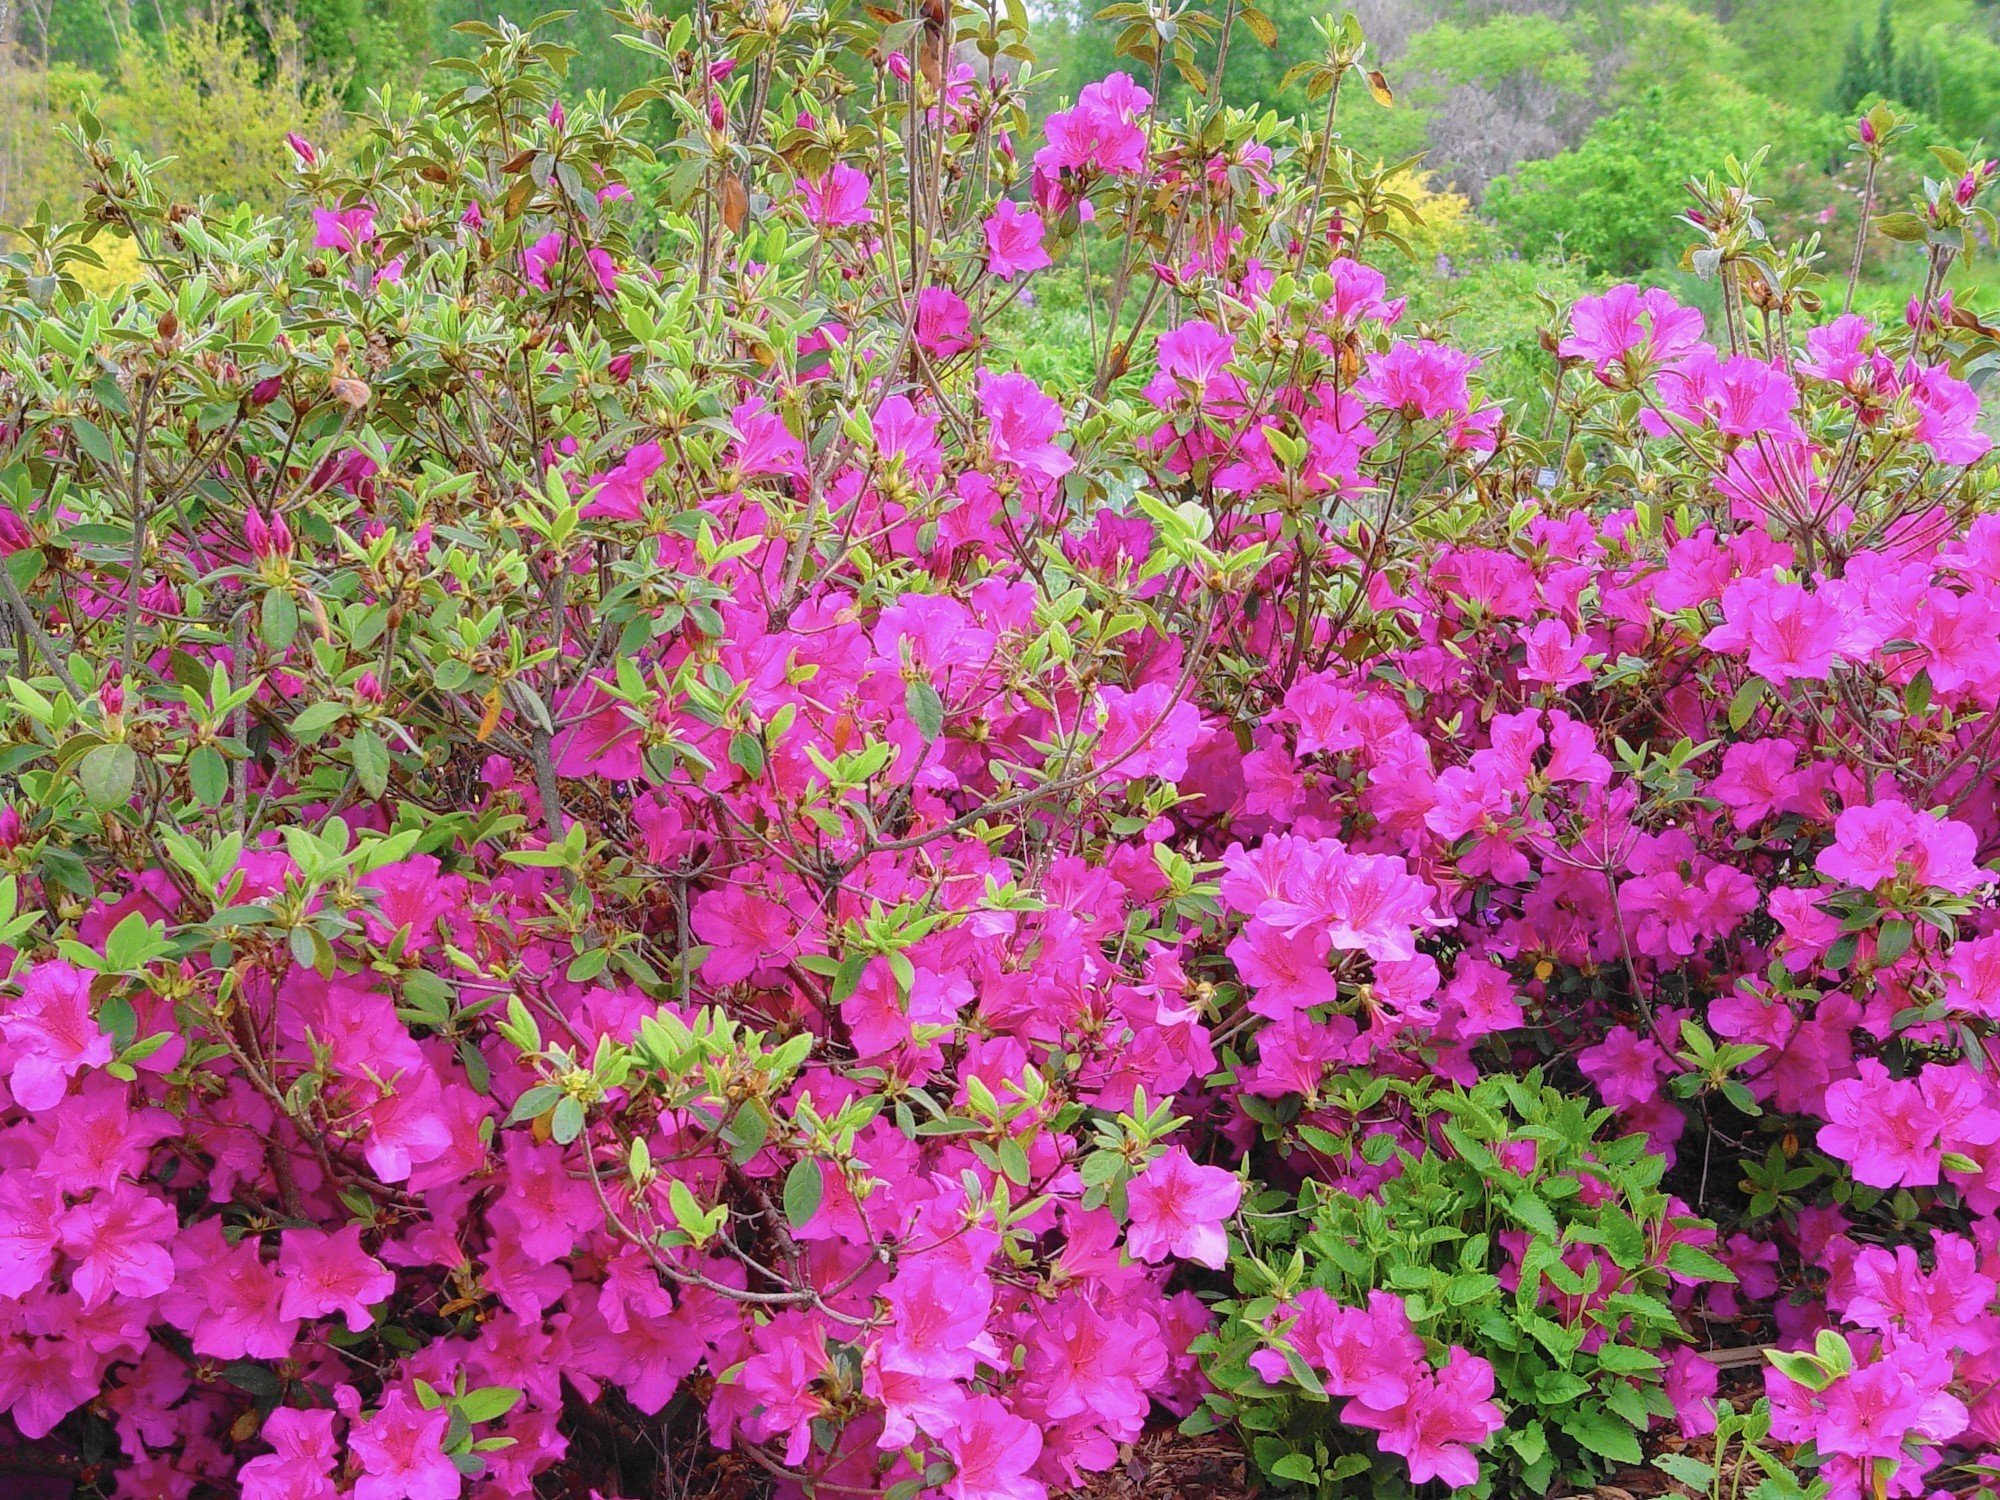 Gardening Prune Spring Bushes In The Week After Blooming